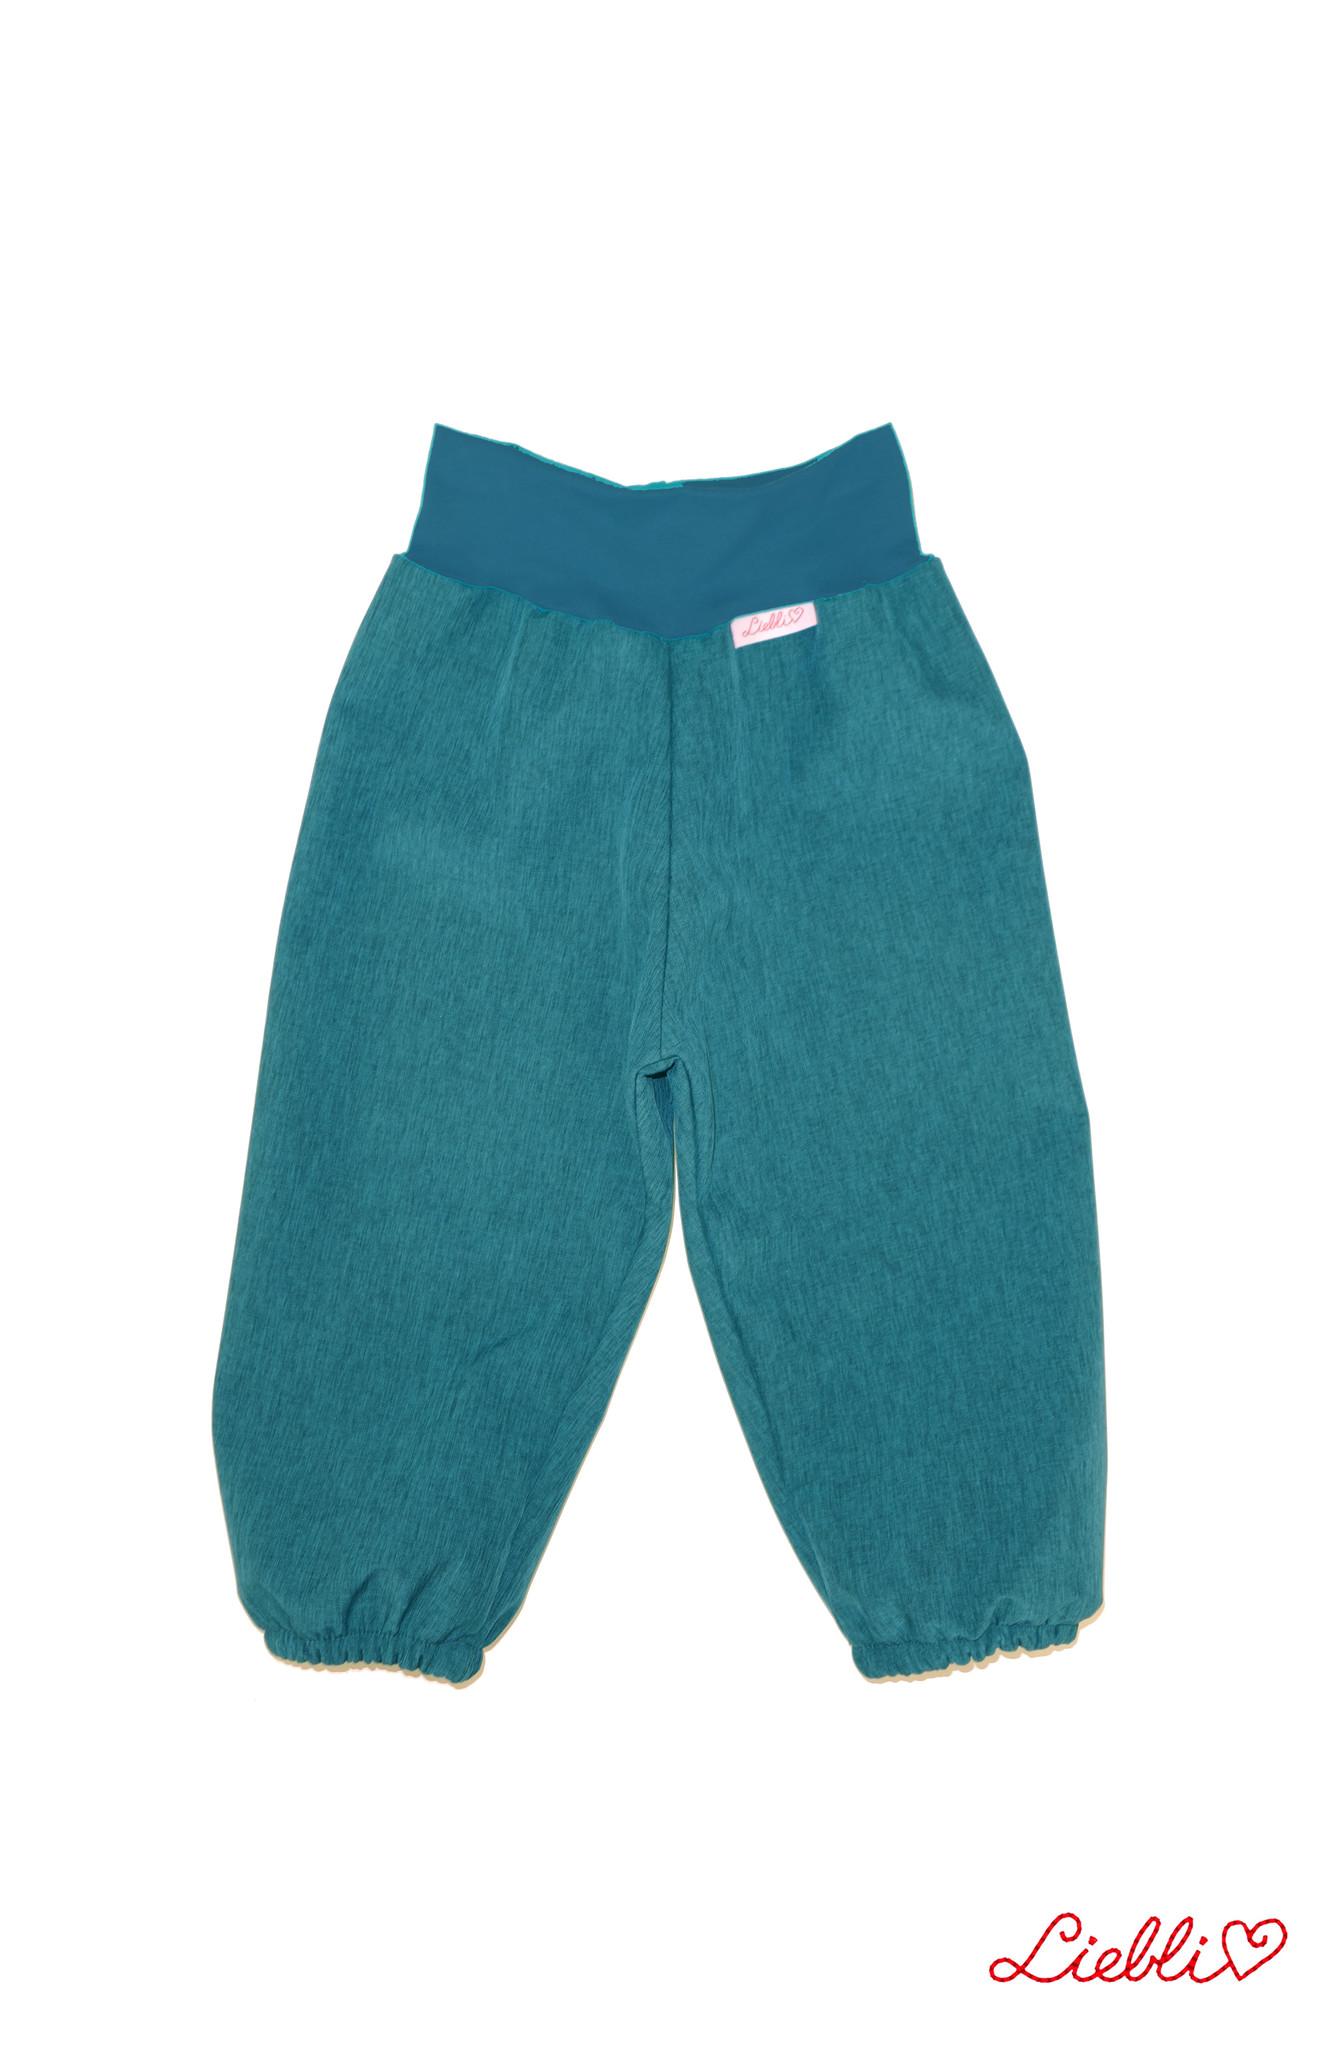 Softshell Hose für Kinder, Outdoor Hose, Regenhose petrol